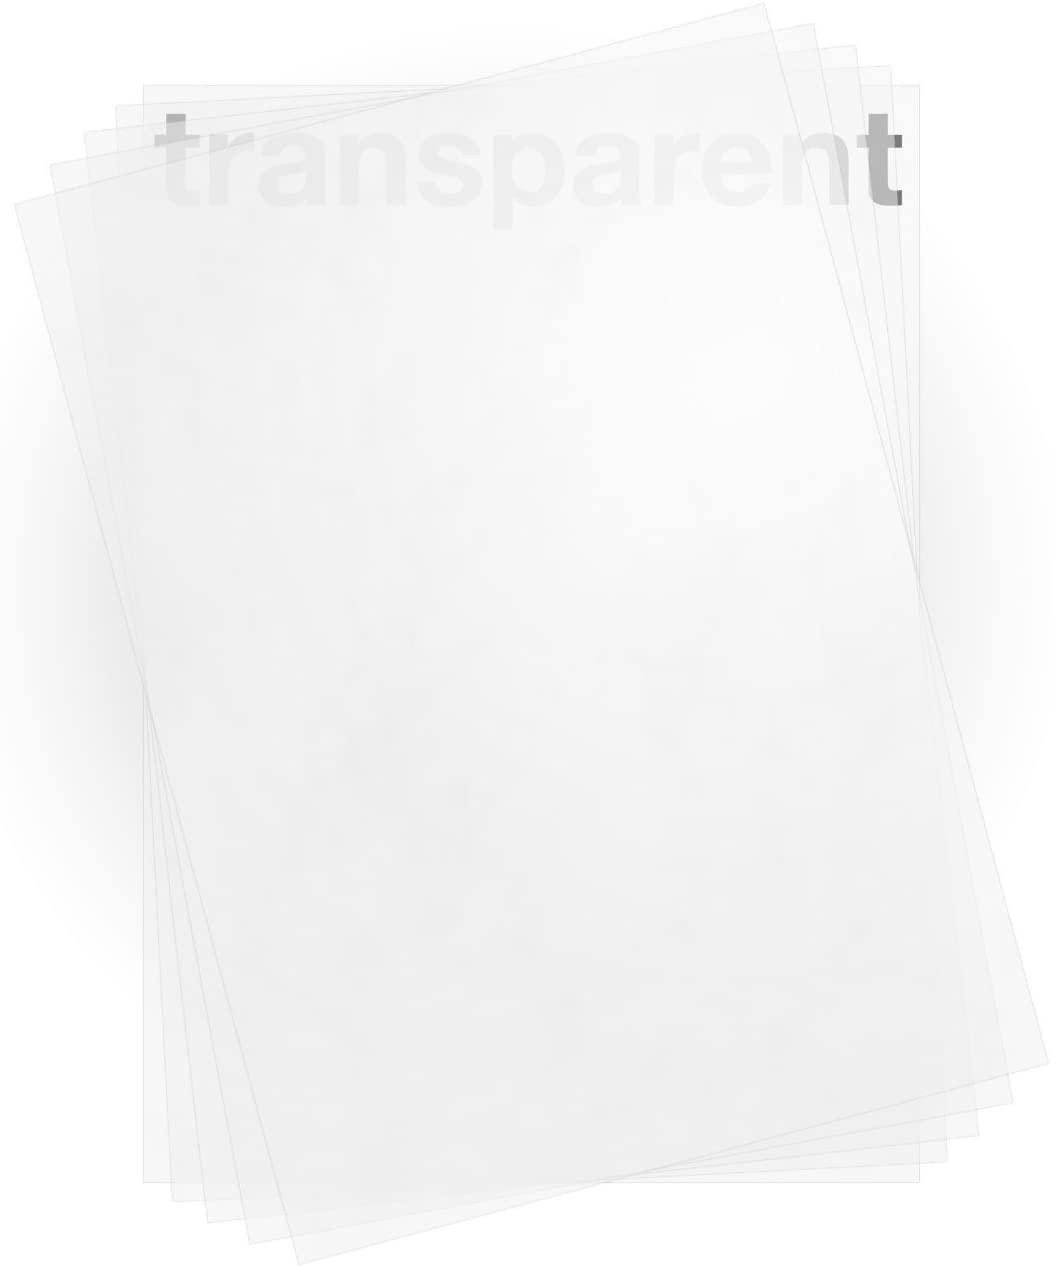 Pergamentpapier Briefpapier A4 100 g//m2 100 Blatt